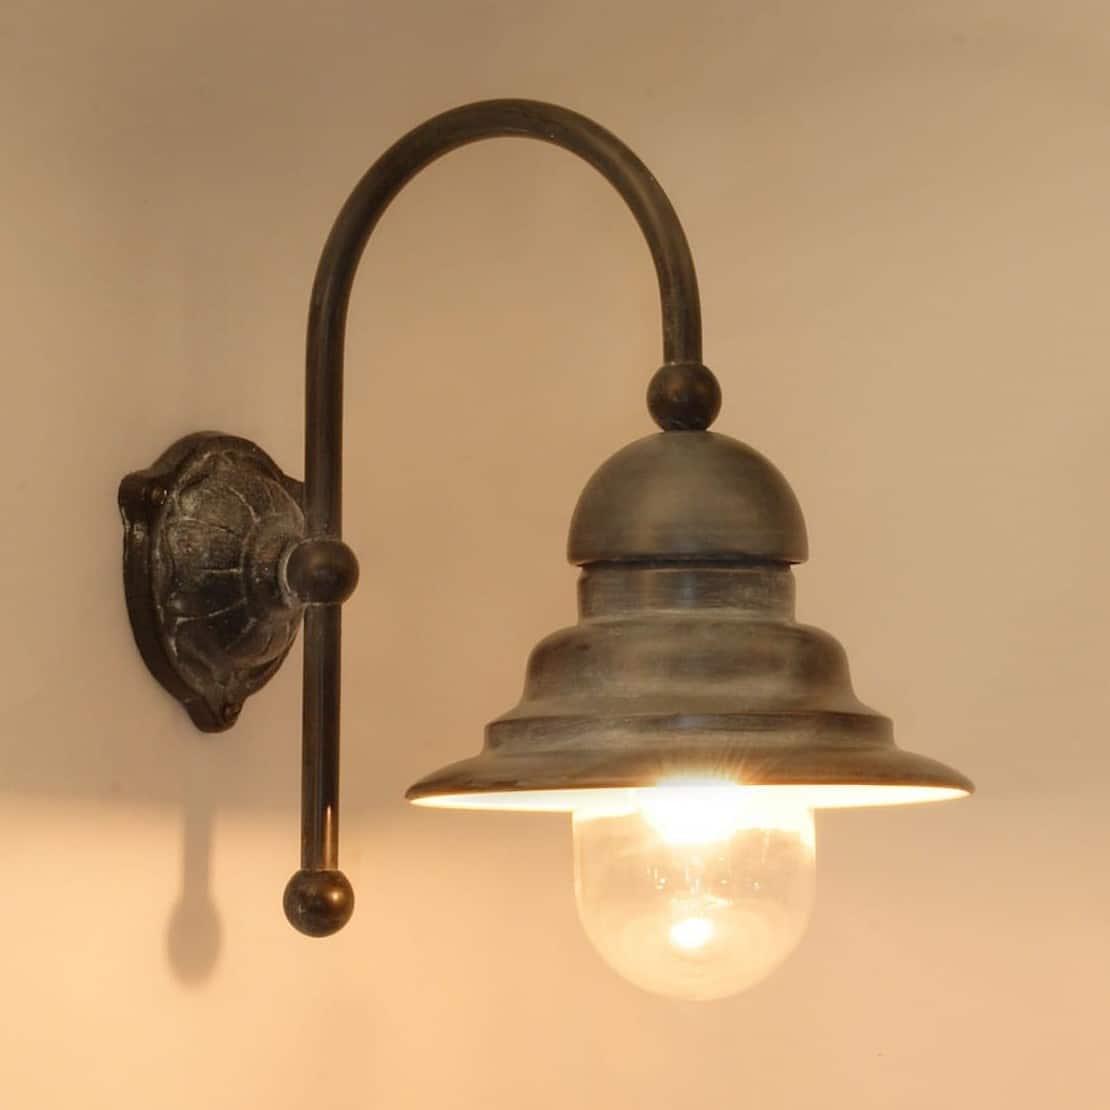 Ceggia Tierlantijn buitenlamp 716 wandlamp lood finish